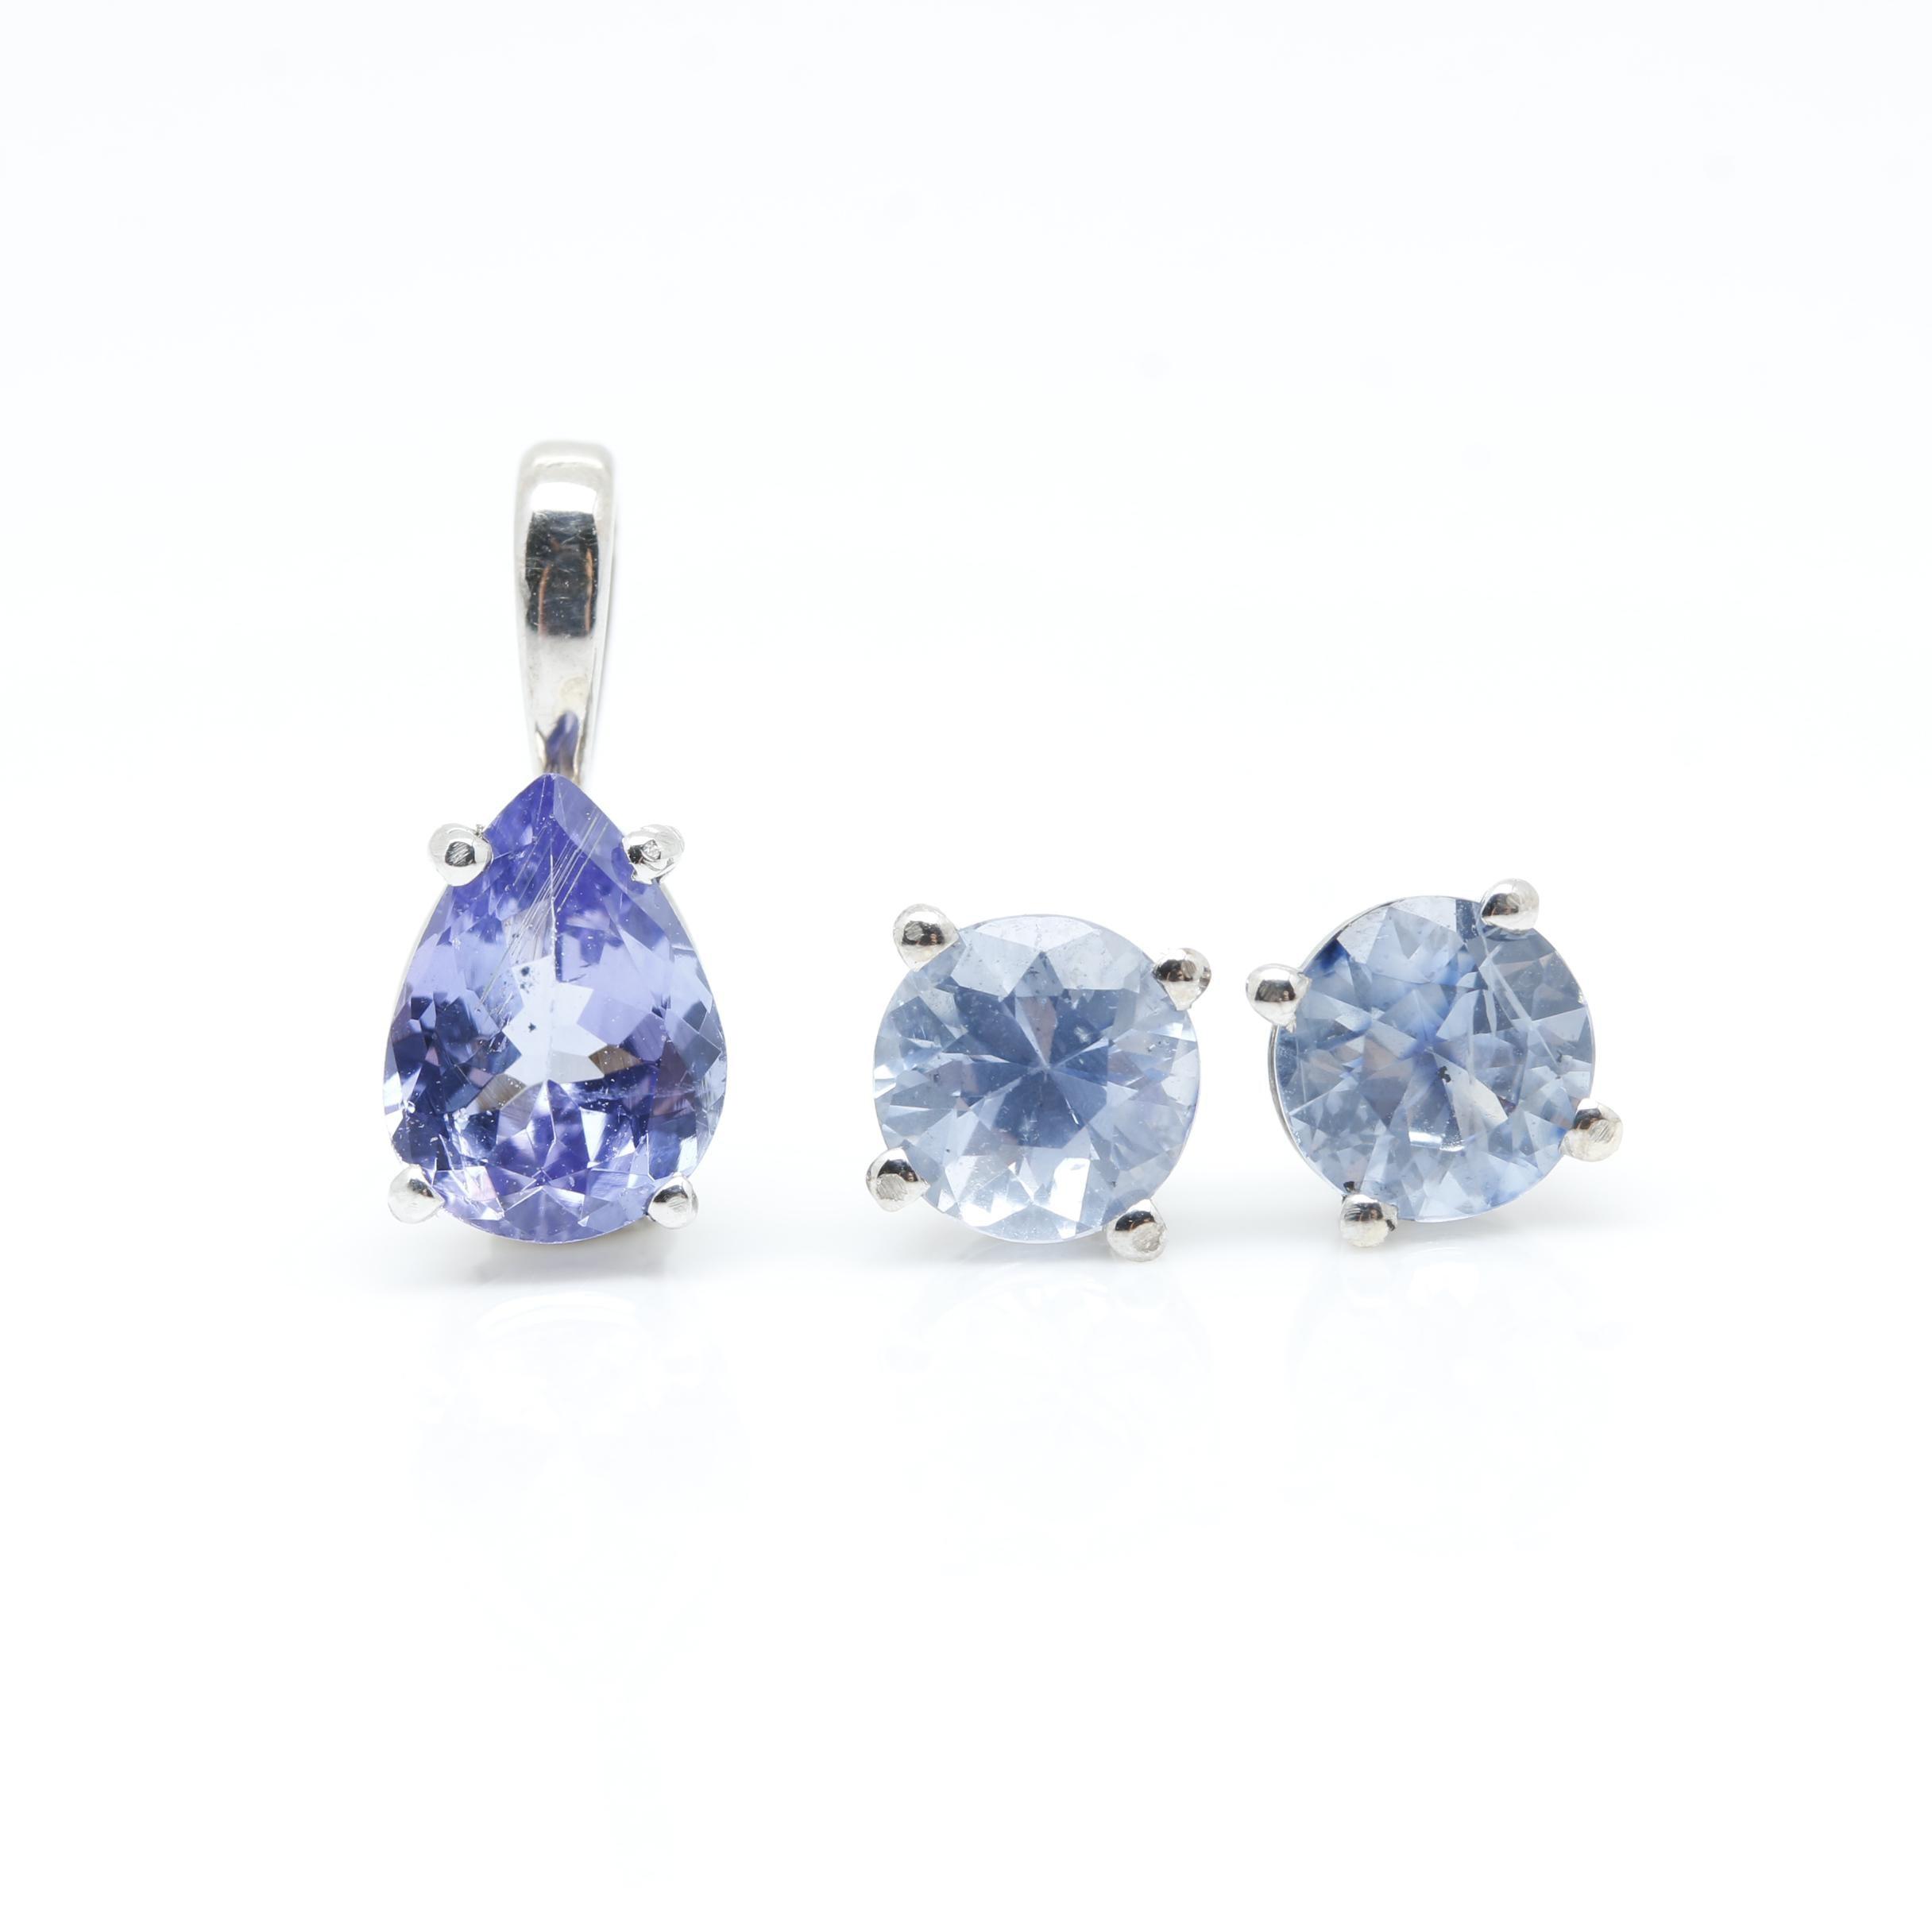 14K White Gold Sapphire Stud Earrings and Tanzanite Pendant